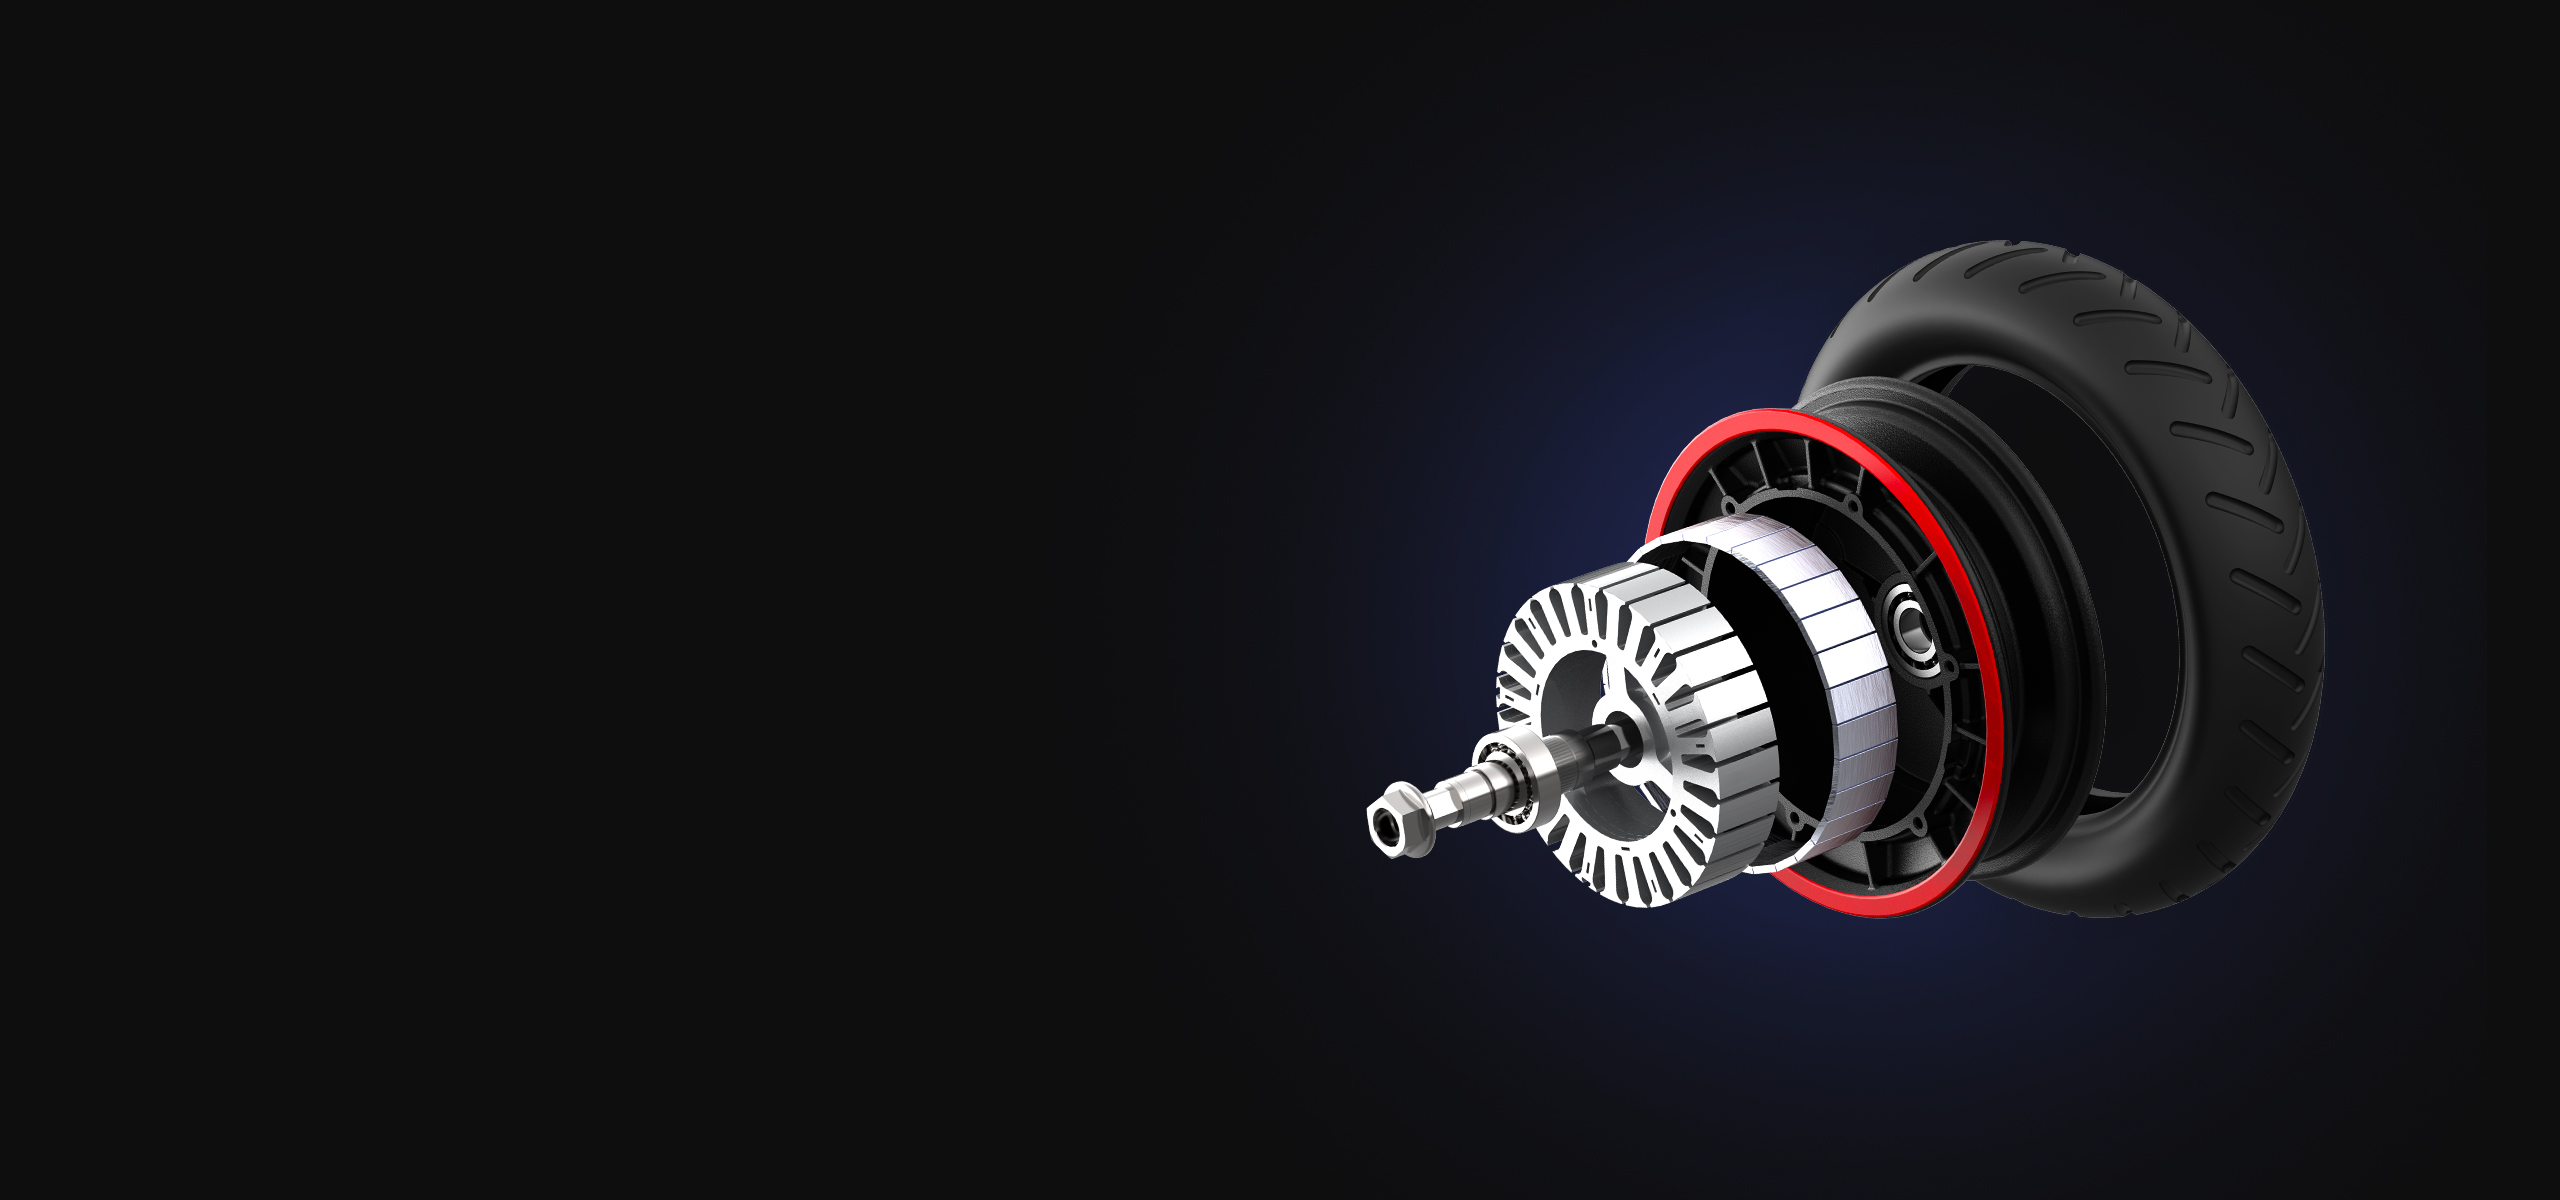 600W powerful motor performance Enjoy the speed